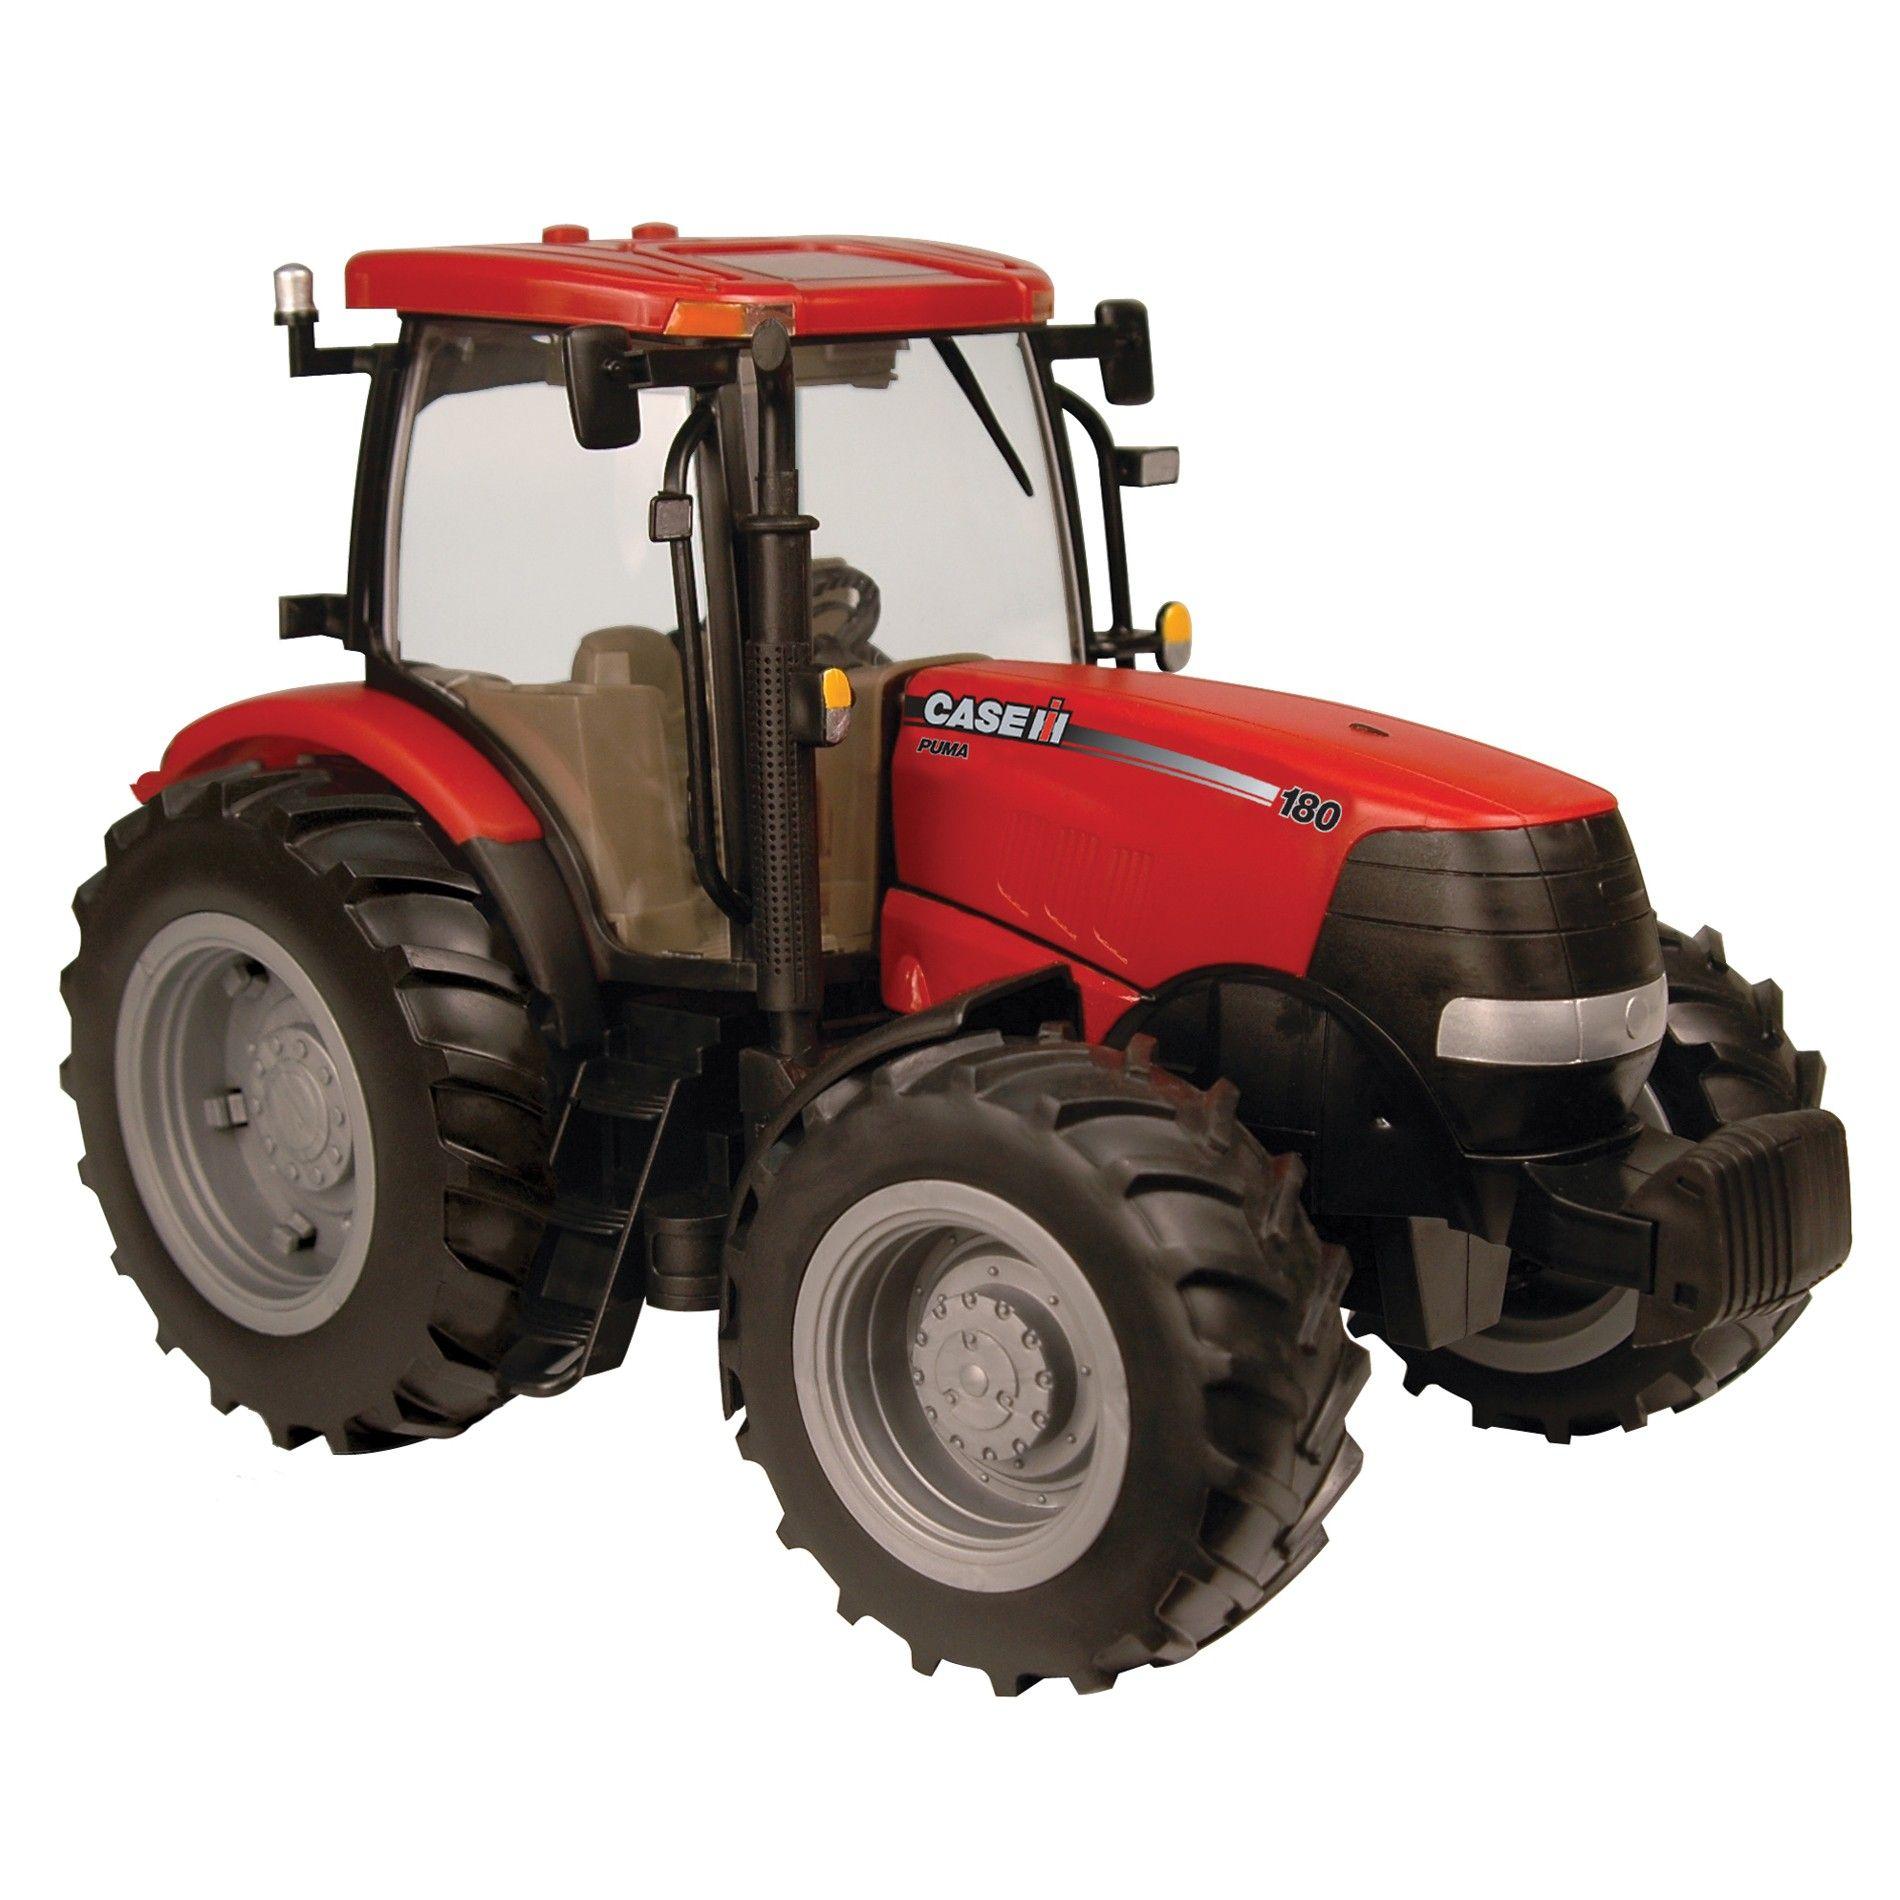 Inernational harvestor tractor clipart images clip art download Case Ih Tractor Clipart - Clipart Kid | Max | Tractors, Farm toys, Toys clip art download